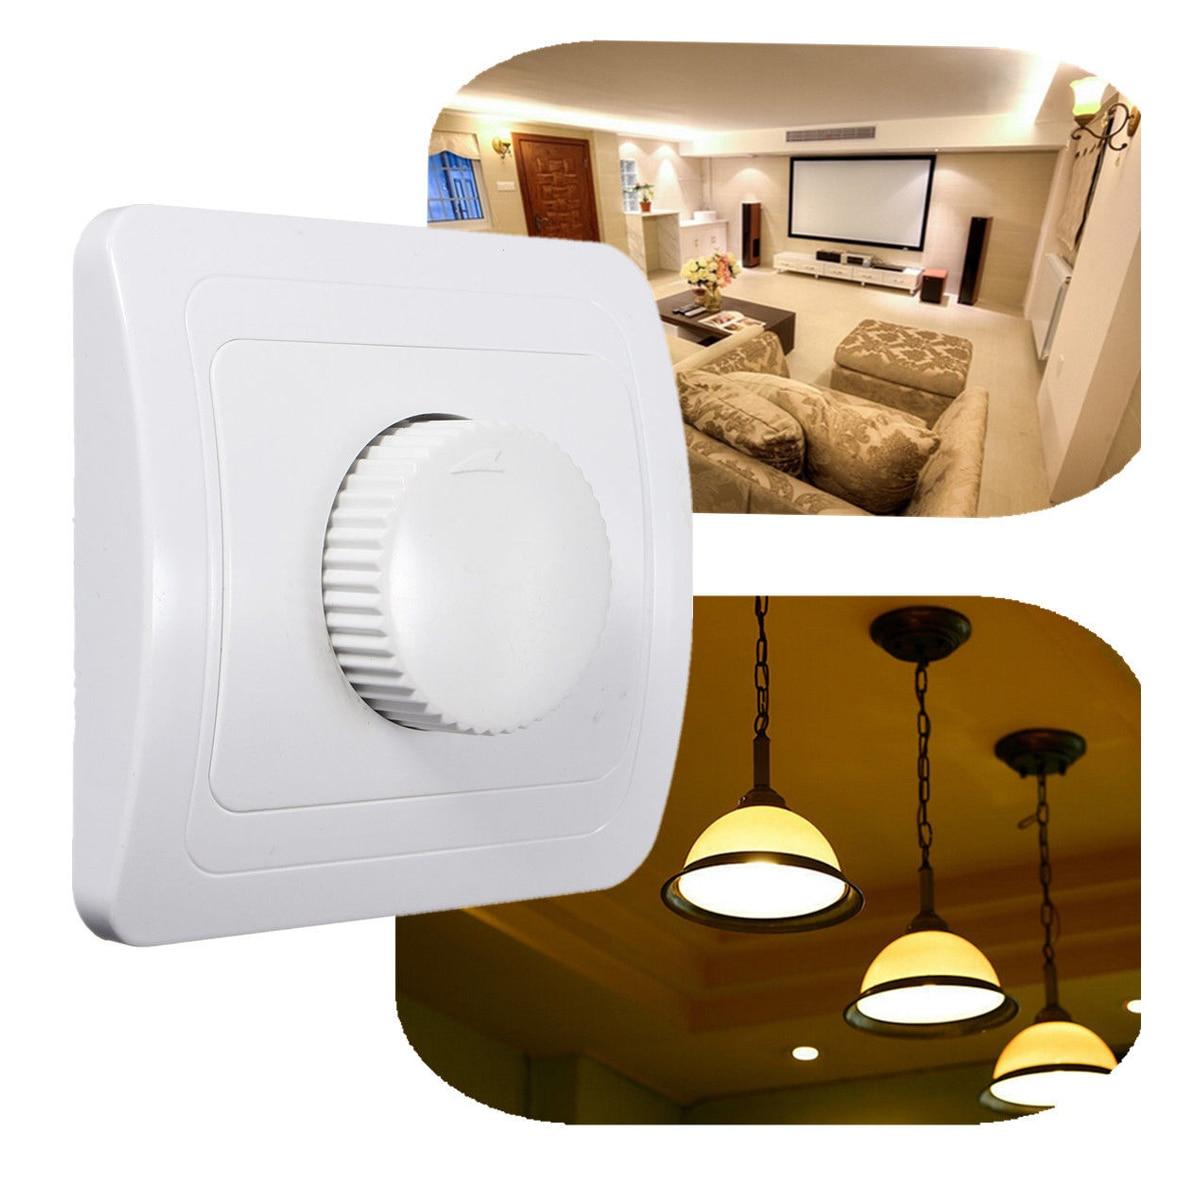 Dimmers dimmer switch para dimmable lâmpada Tipo de Item : Reguladordeluz